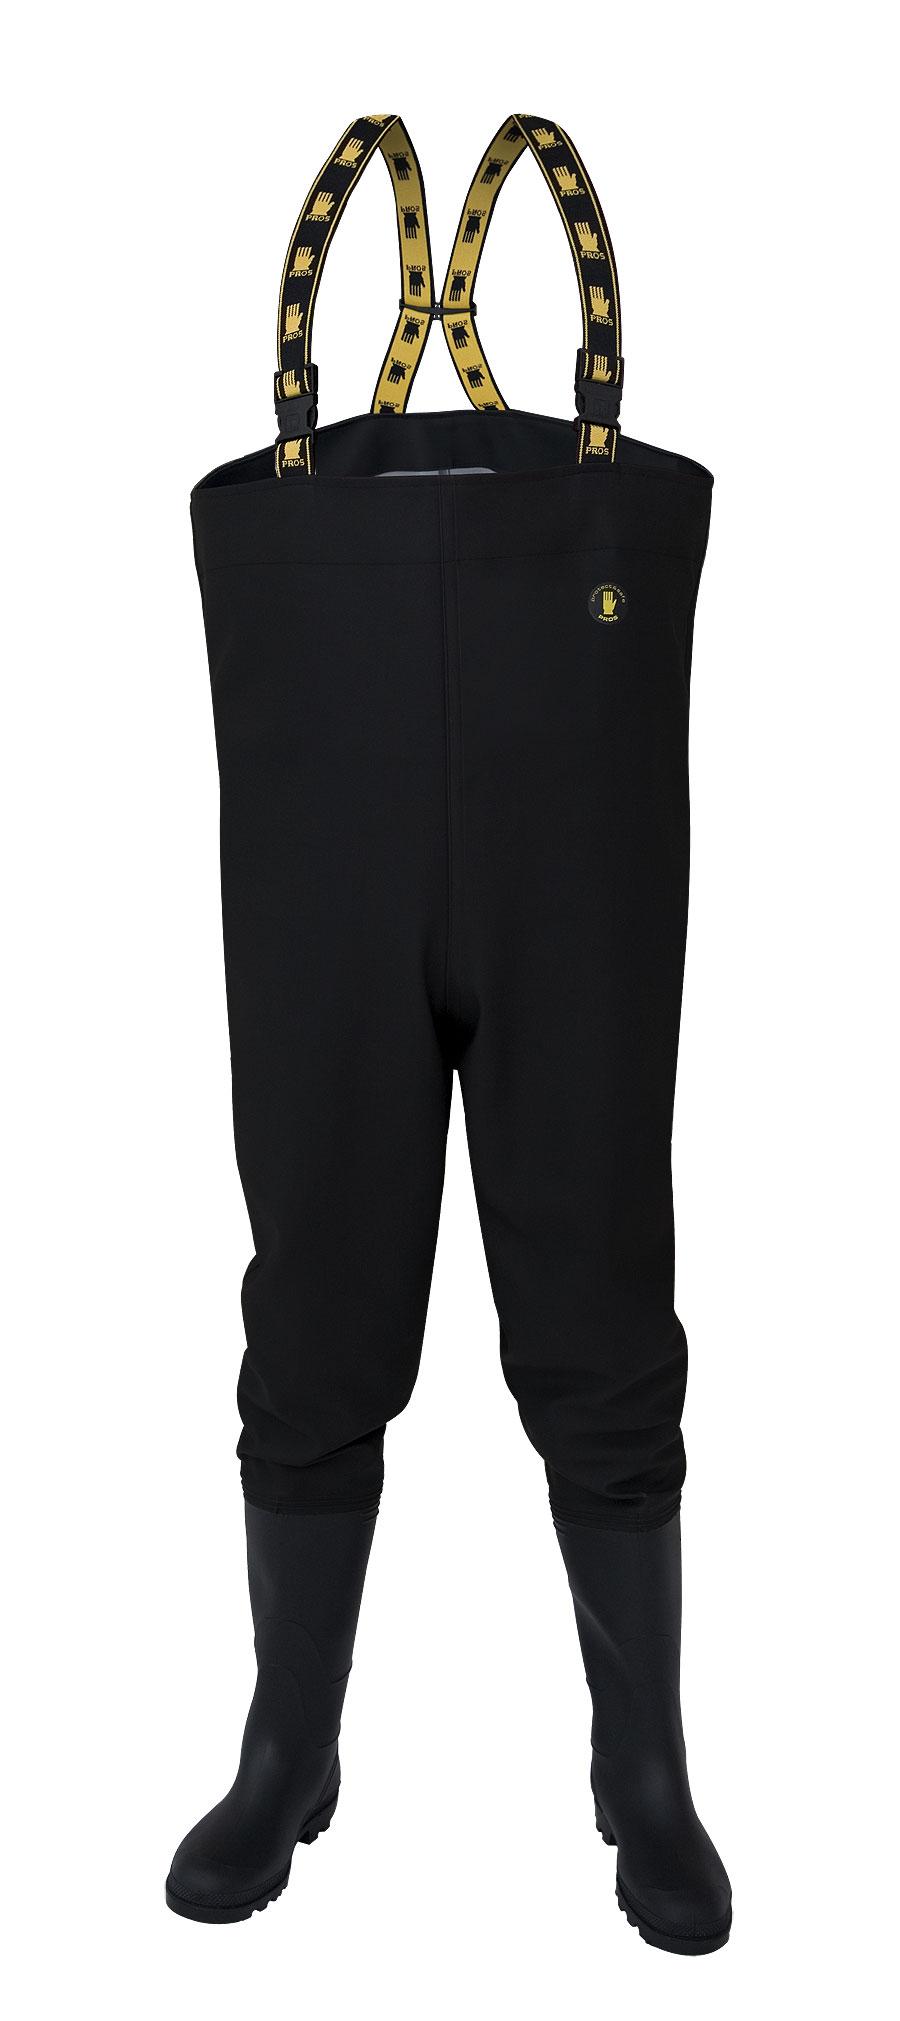 Spodniobuty Wodery PROS SB01 Czarne r.41 с Польский